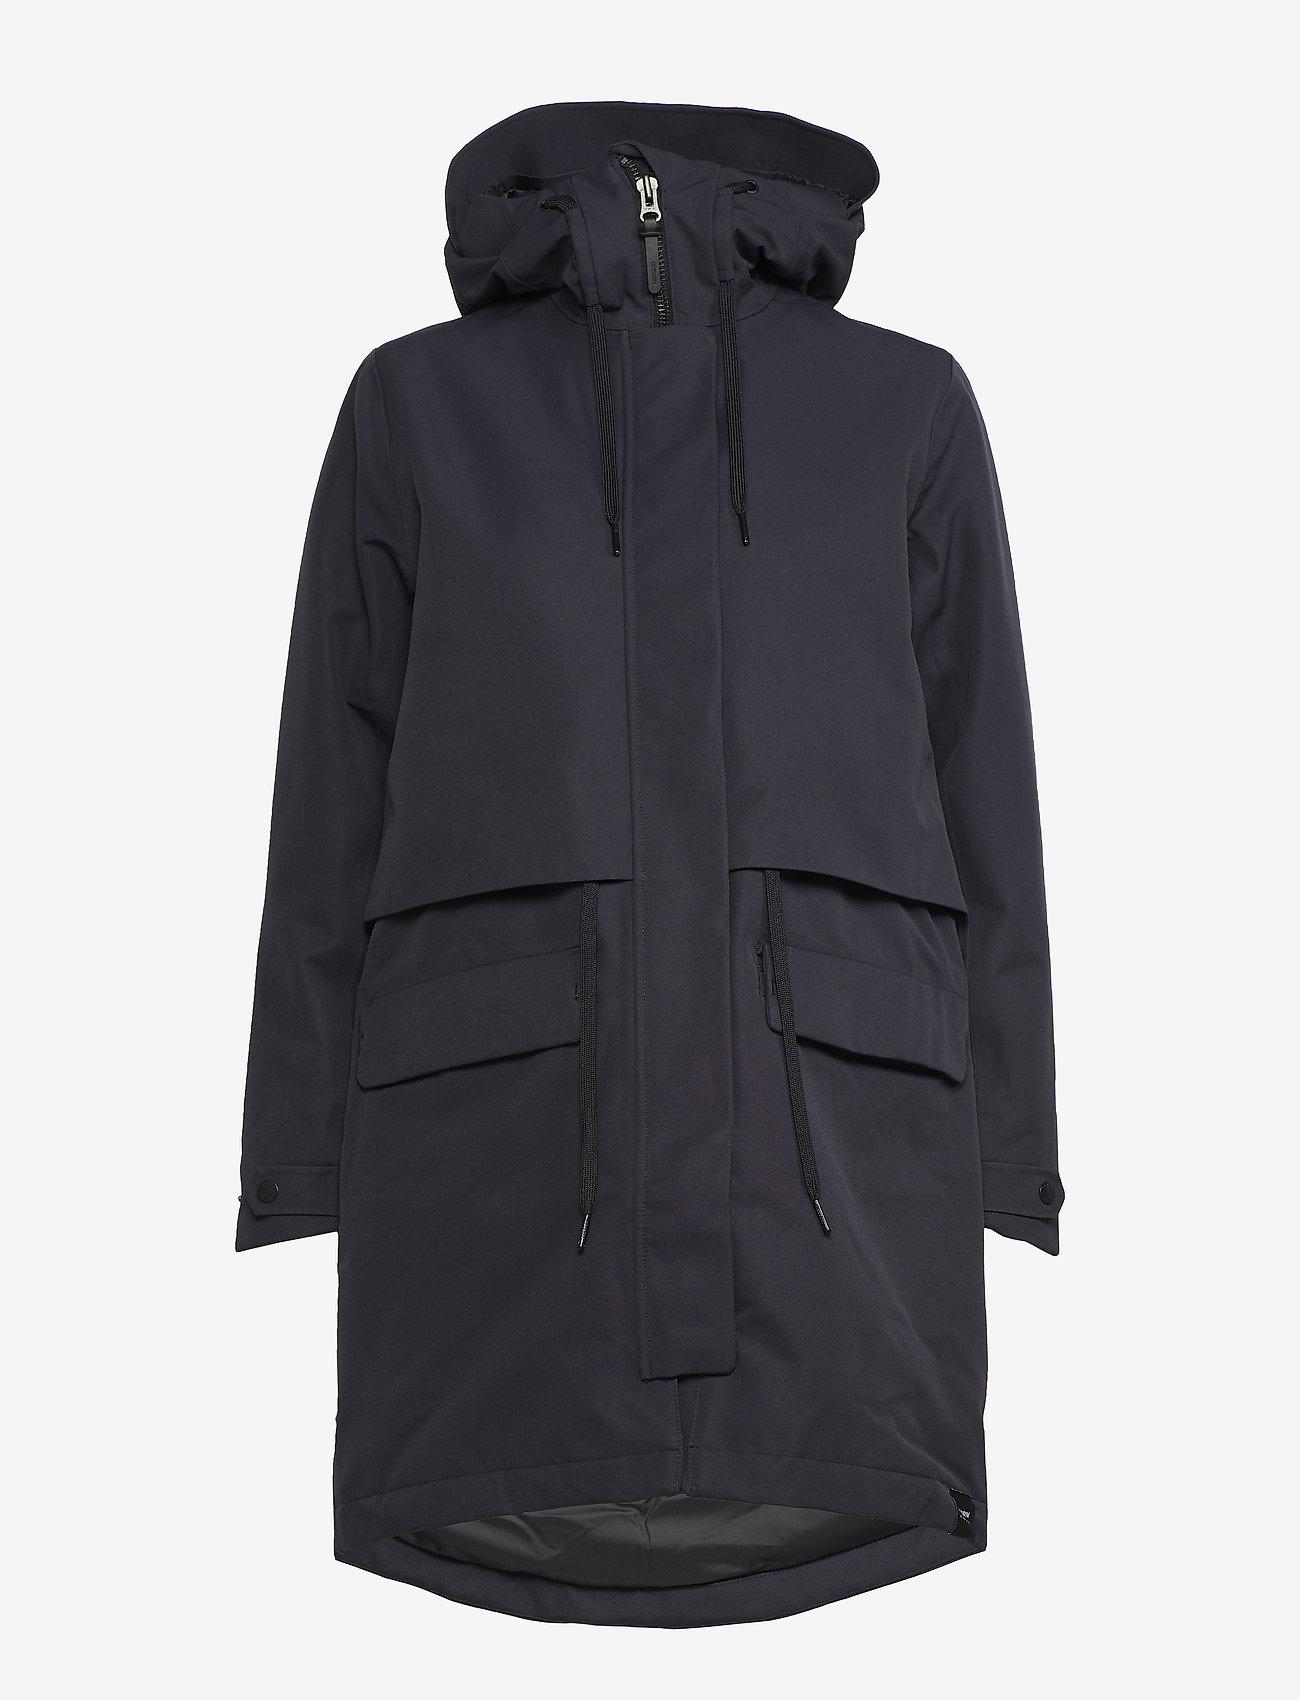 Tretorn - ARCH JKT WMN - vêtements de pluie - 084/dark navy - 1